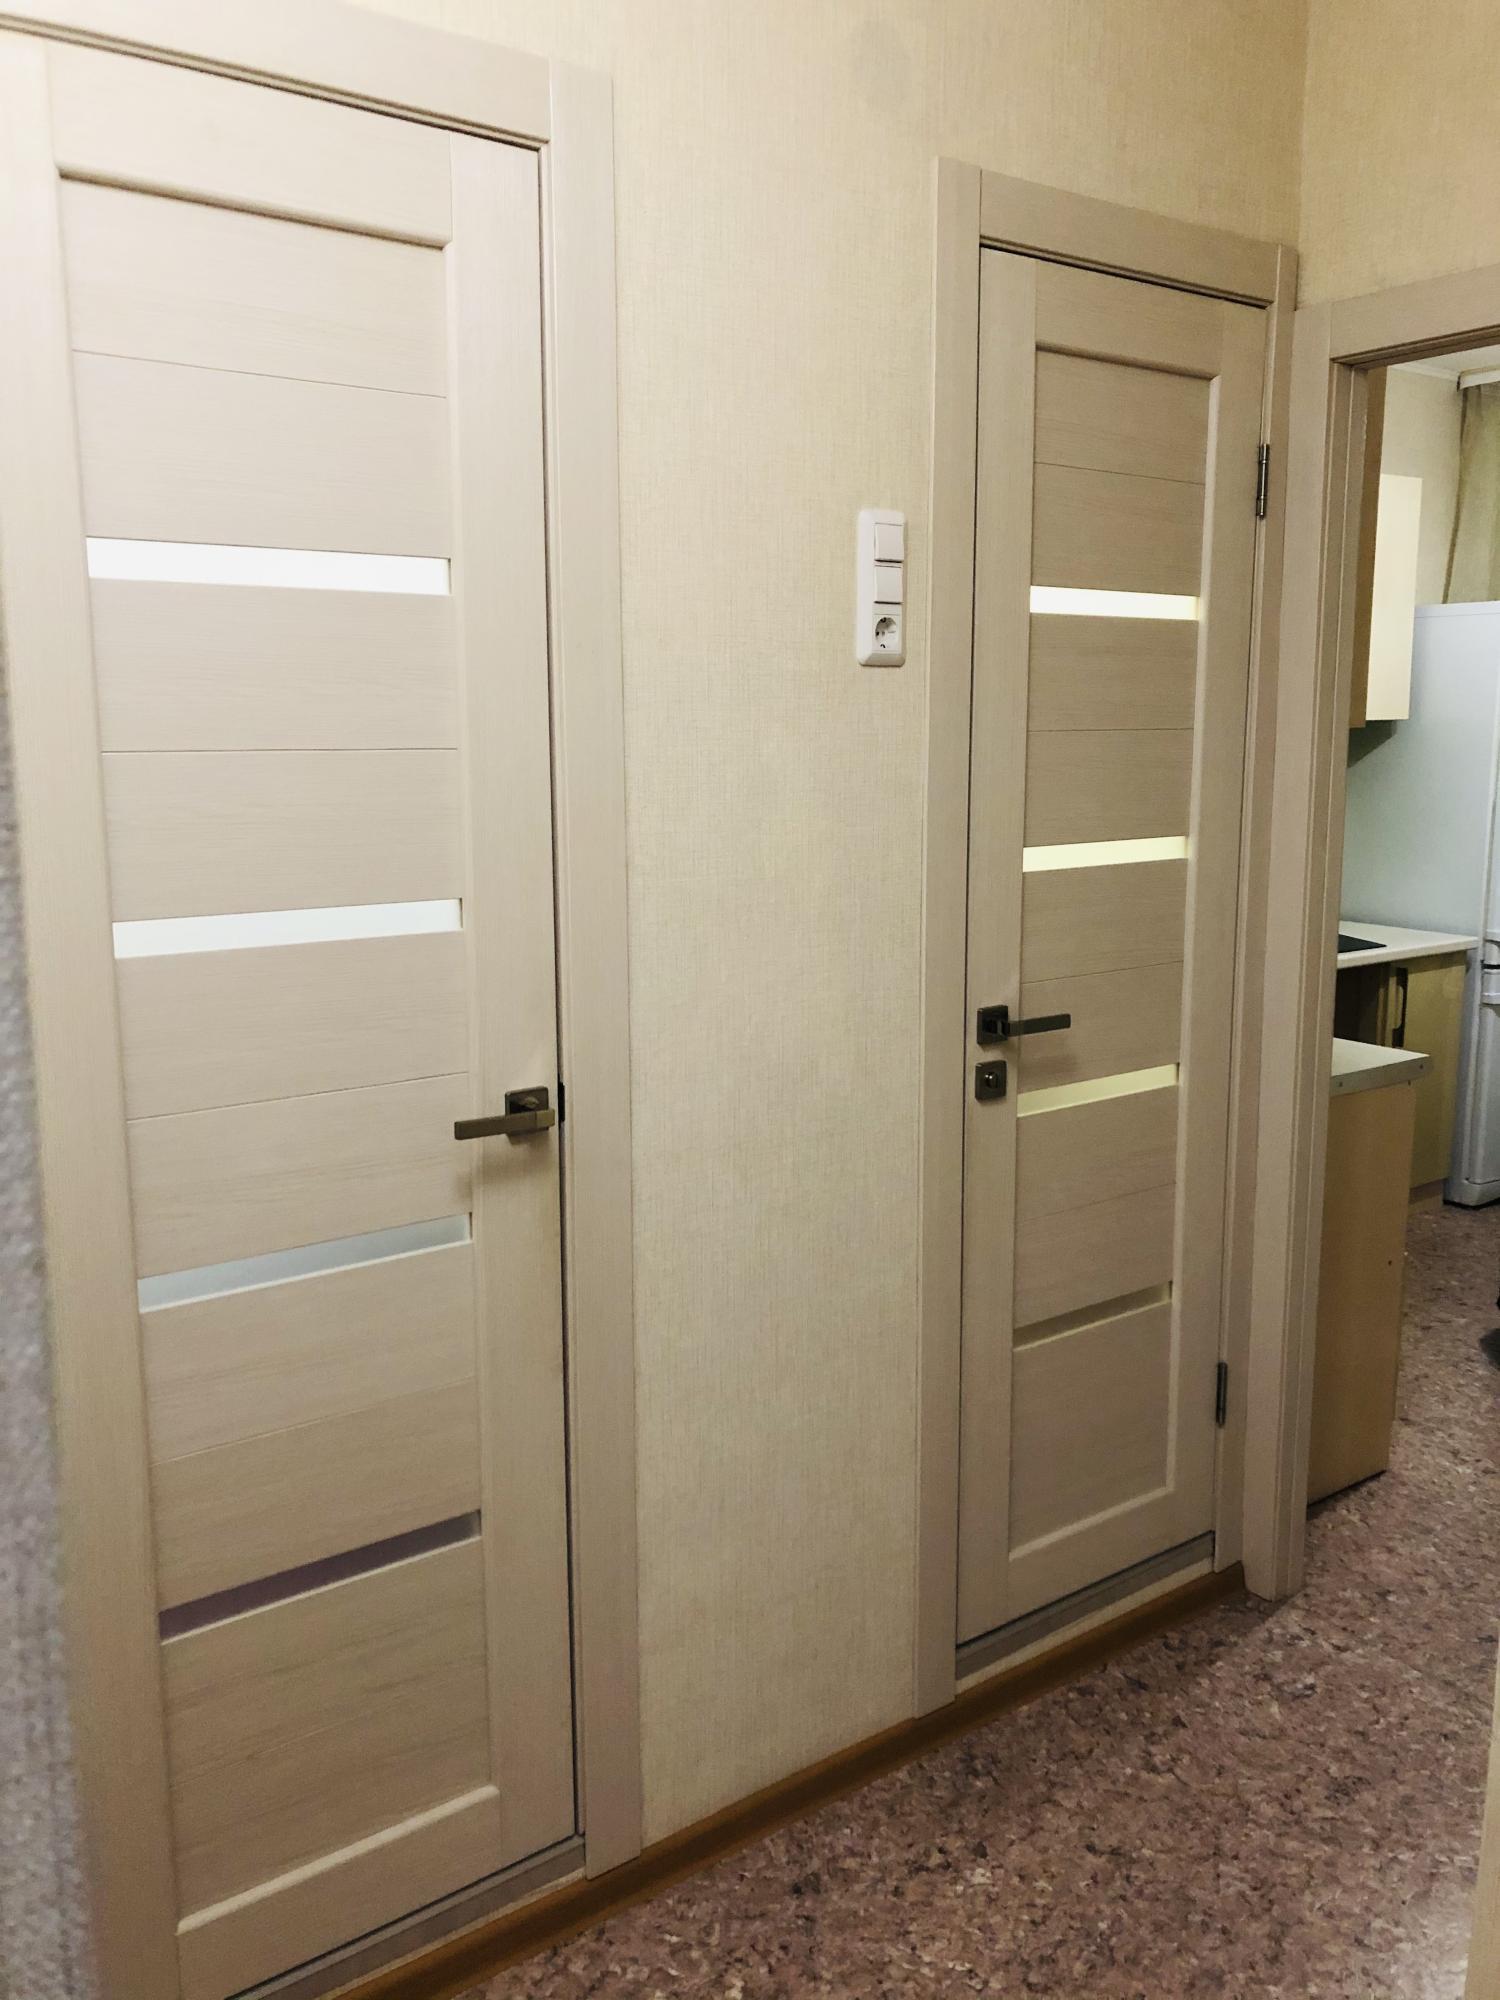 1к квартира Караульная улица, 48   20000   аренда в Красноярске фото 8